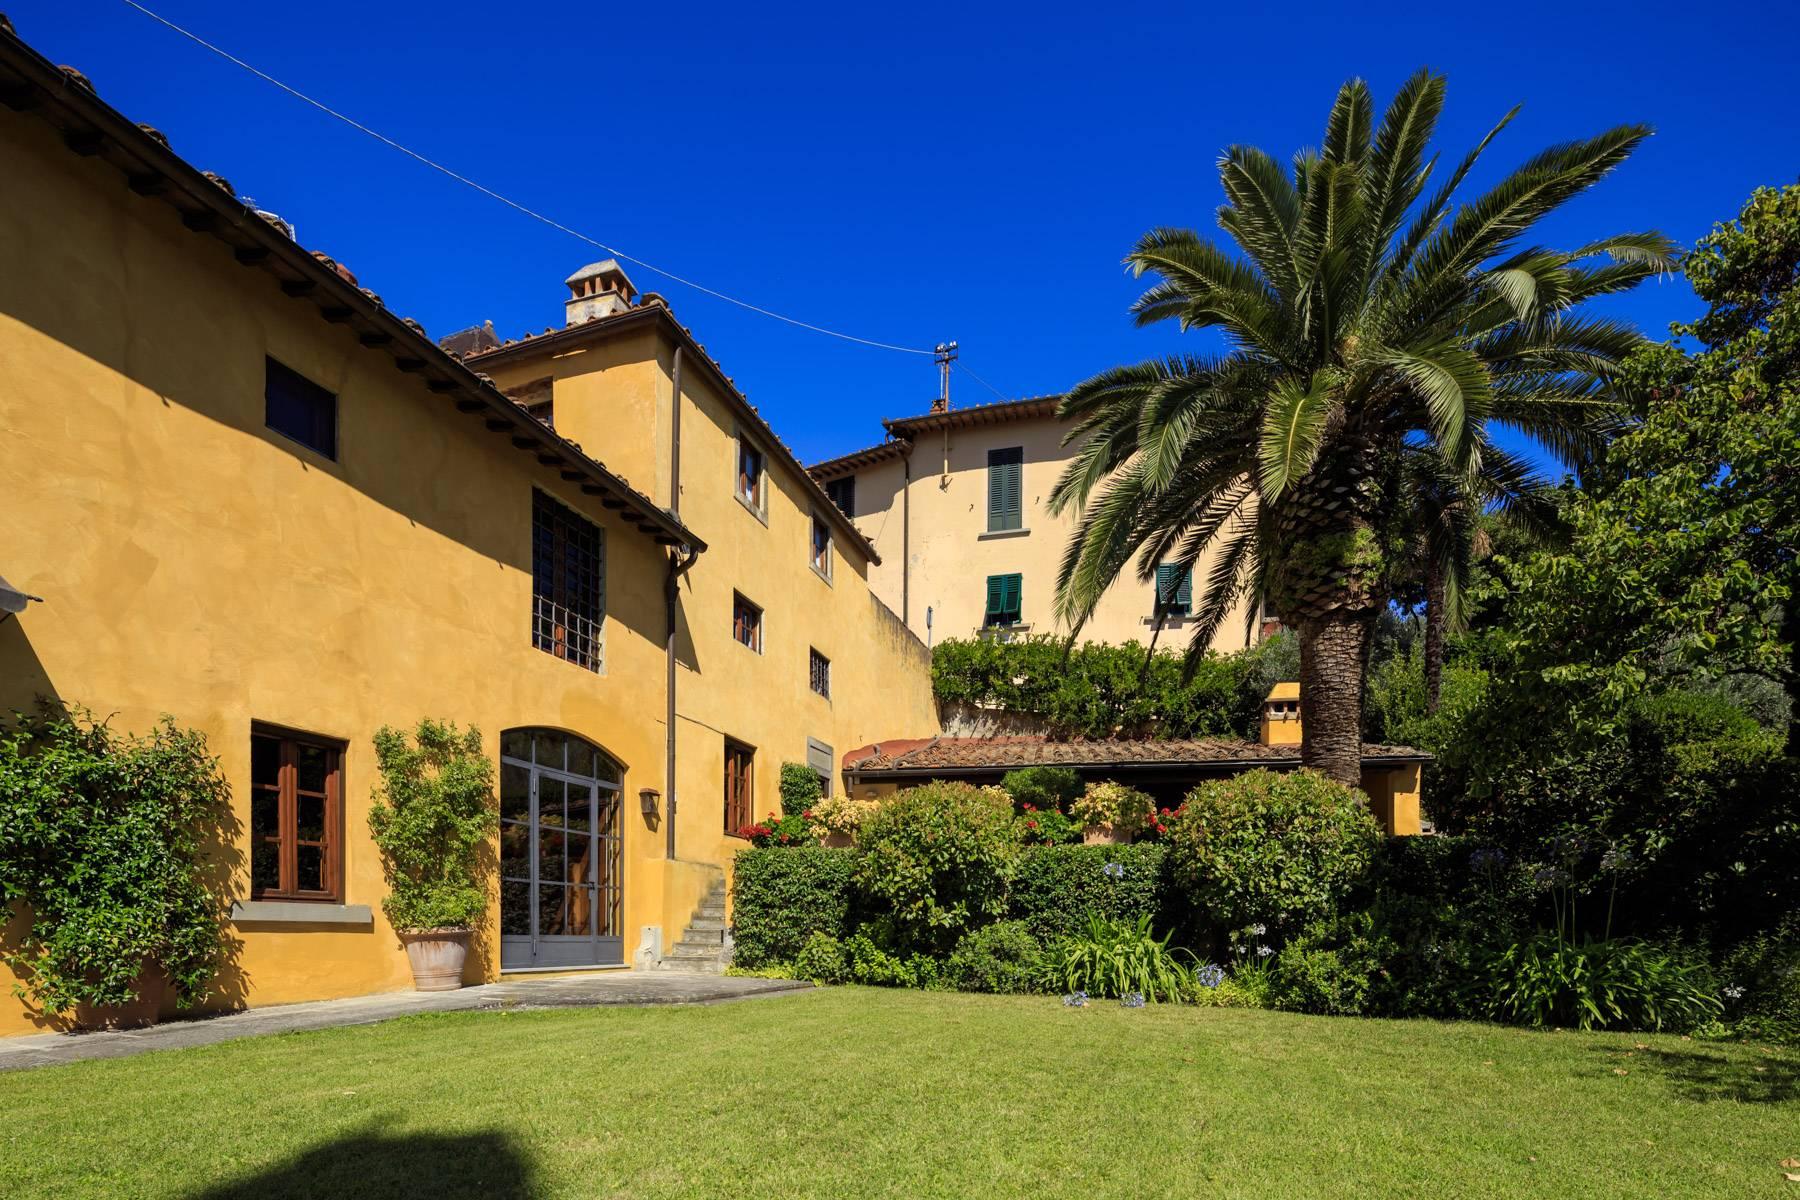 Villa in Affitto a Firenze: 5 locali, 600 mq - Foto 3